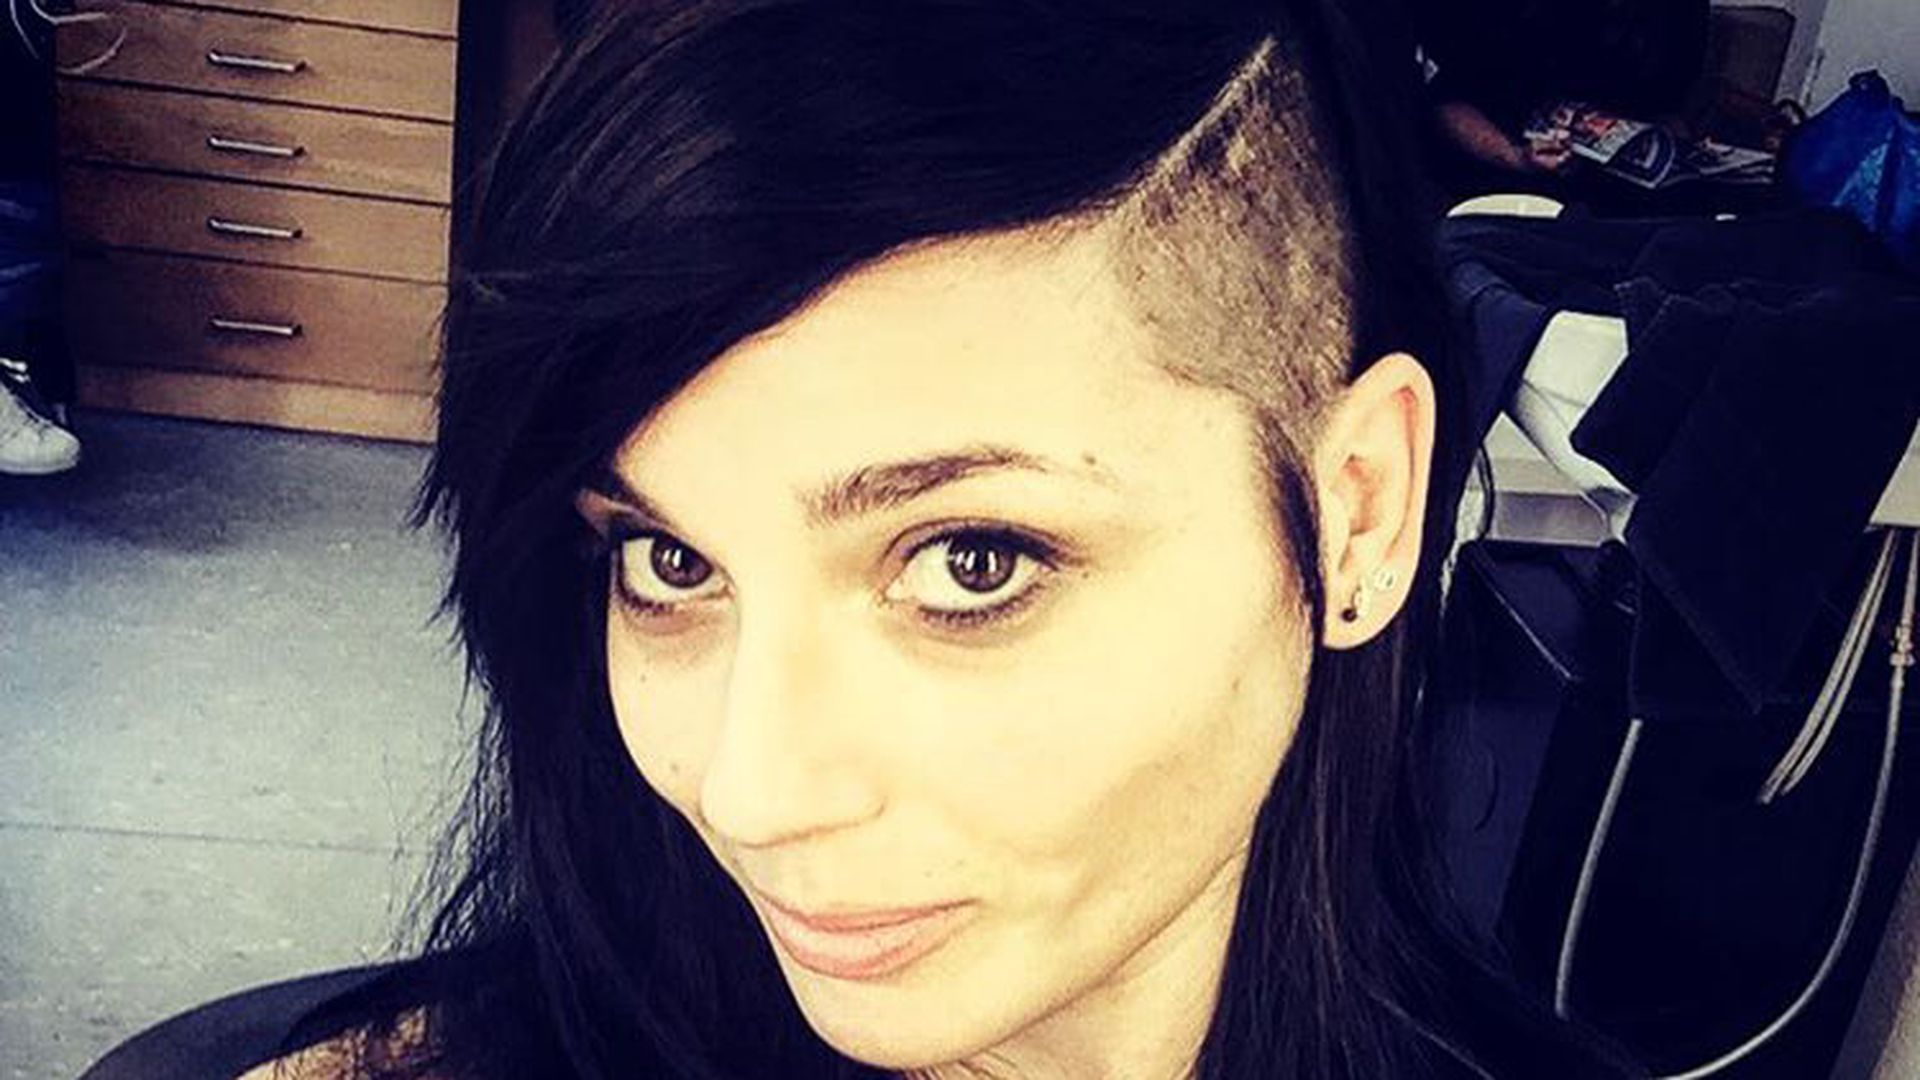 Neuer Punk Look GZSZ Anni Trägt Jetzt Sidecut! Promiflash De